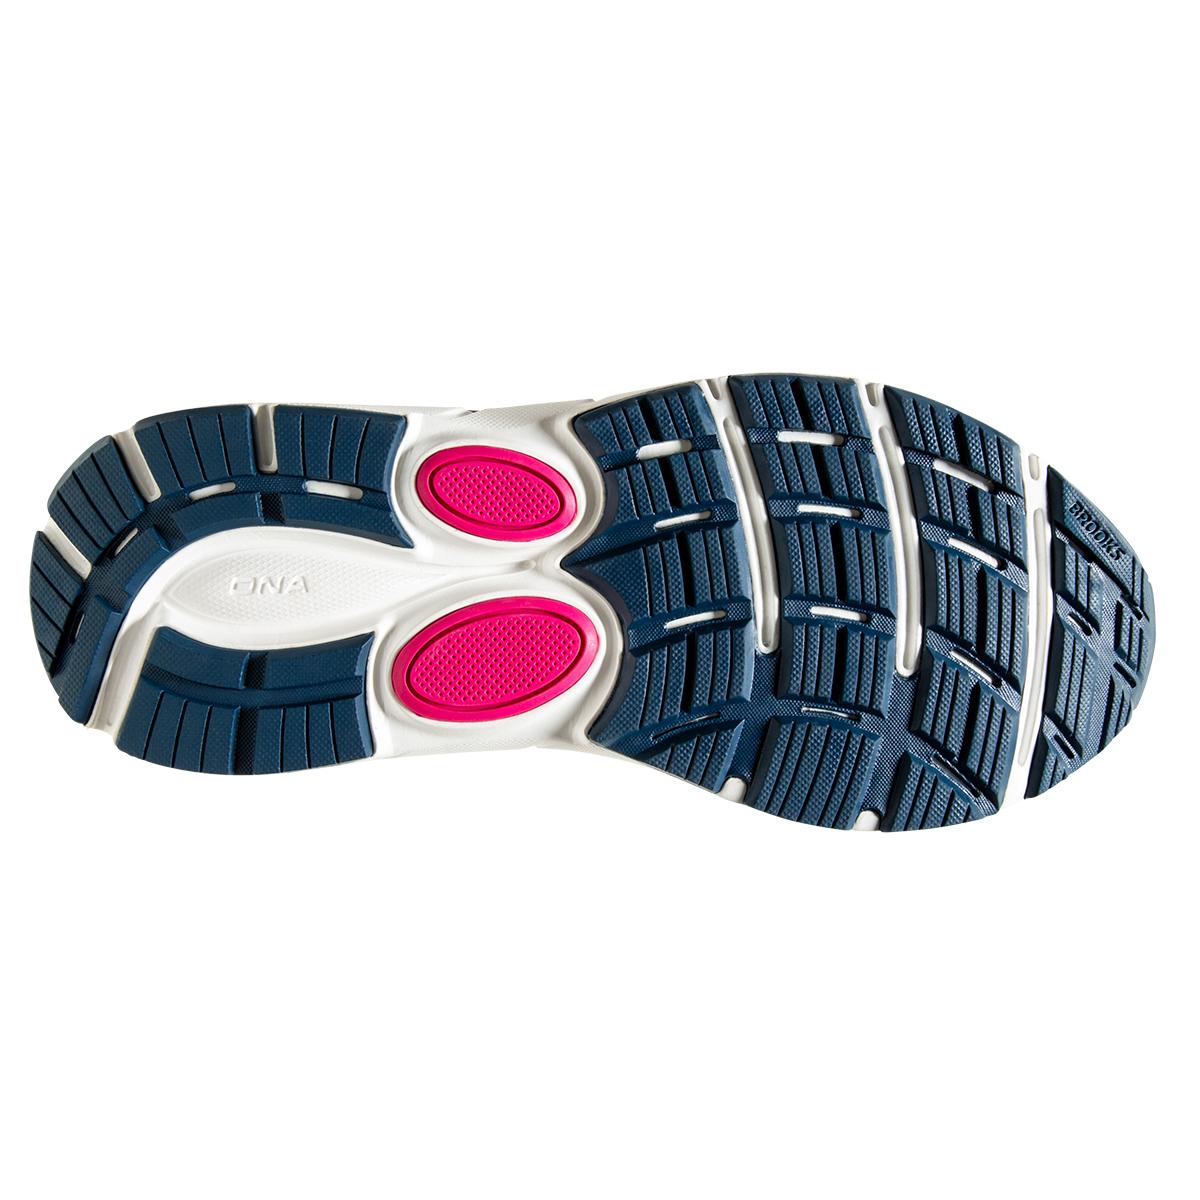 Women's Brooks Dyad 11 Running Shoe - Color: Blue/Navy/Beetroot (Regular Width) - Size: 7.5, Blue/Navy/Beetroot, large, image 6